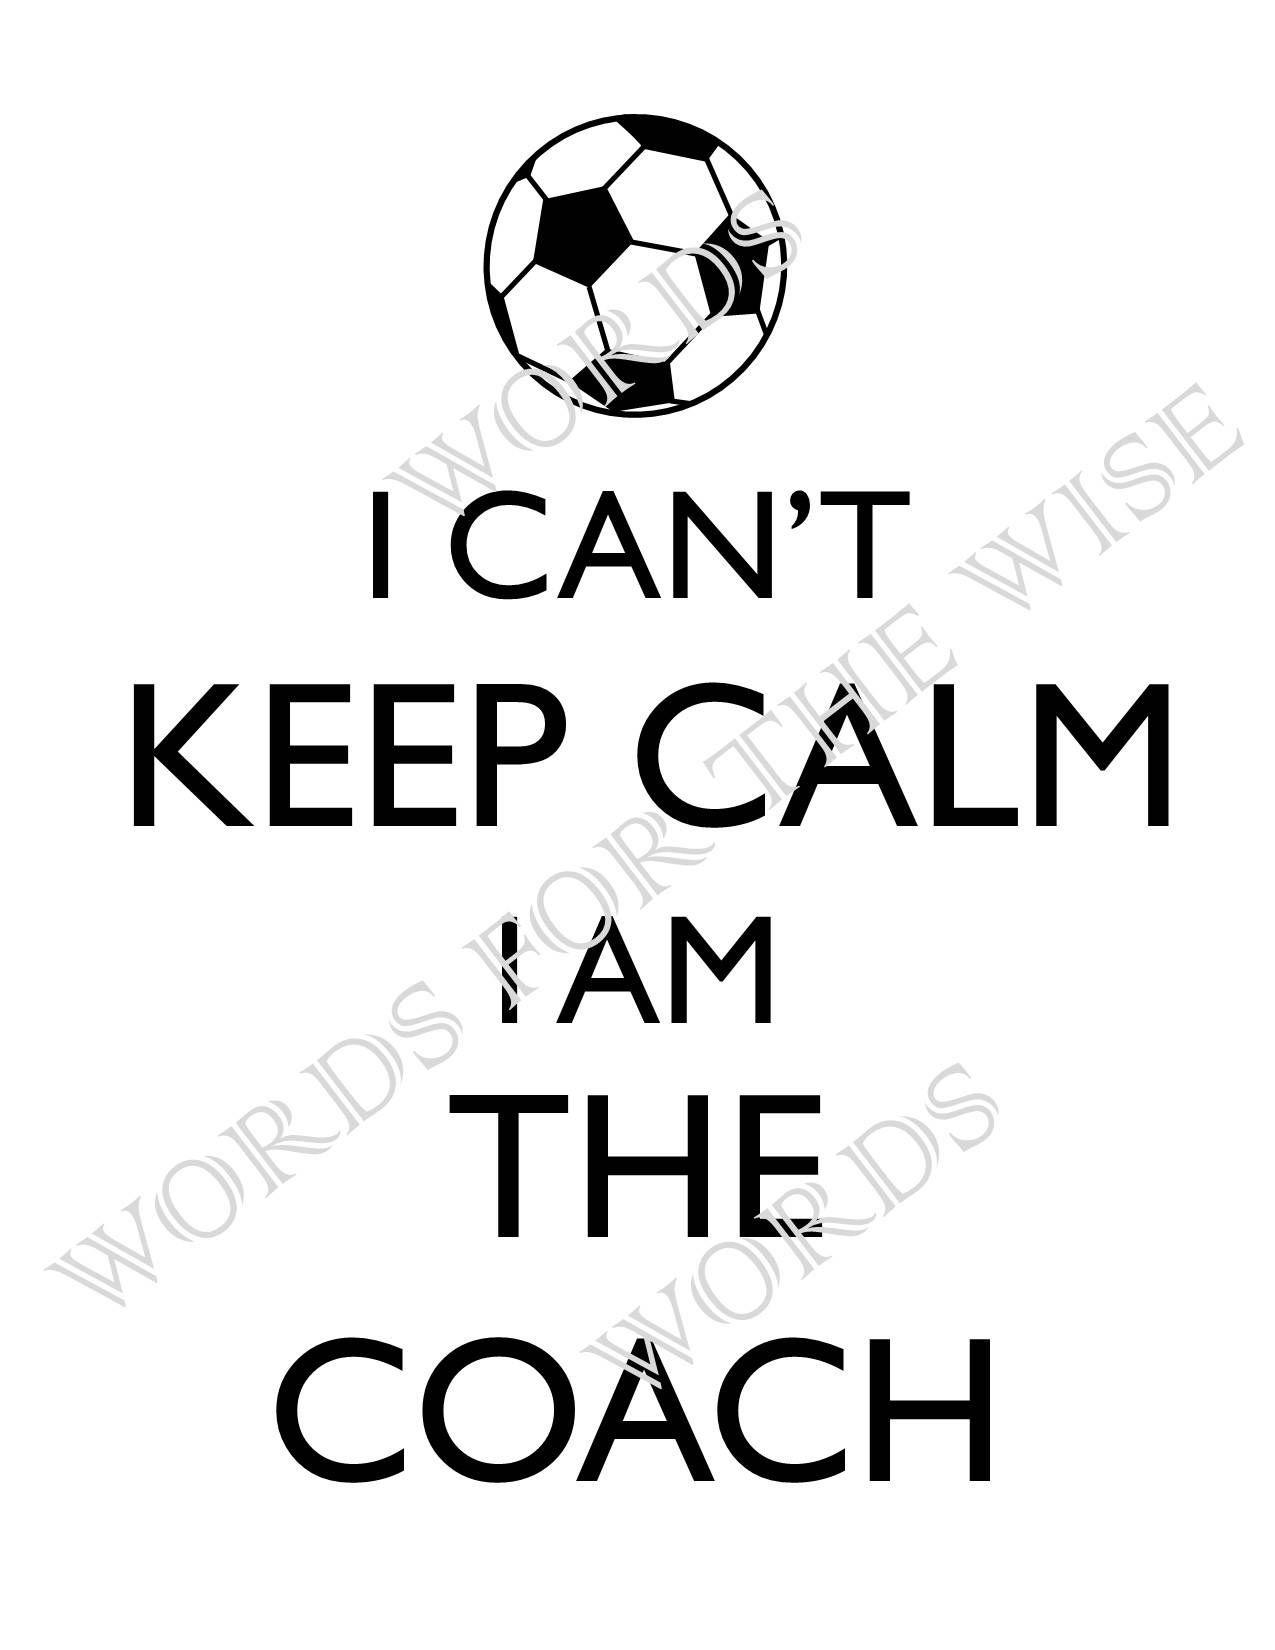 I Can't Keep Calm, I am the Coach- Soccer Coach, Coach's